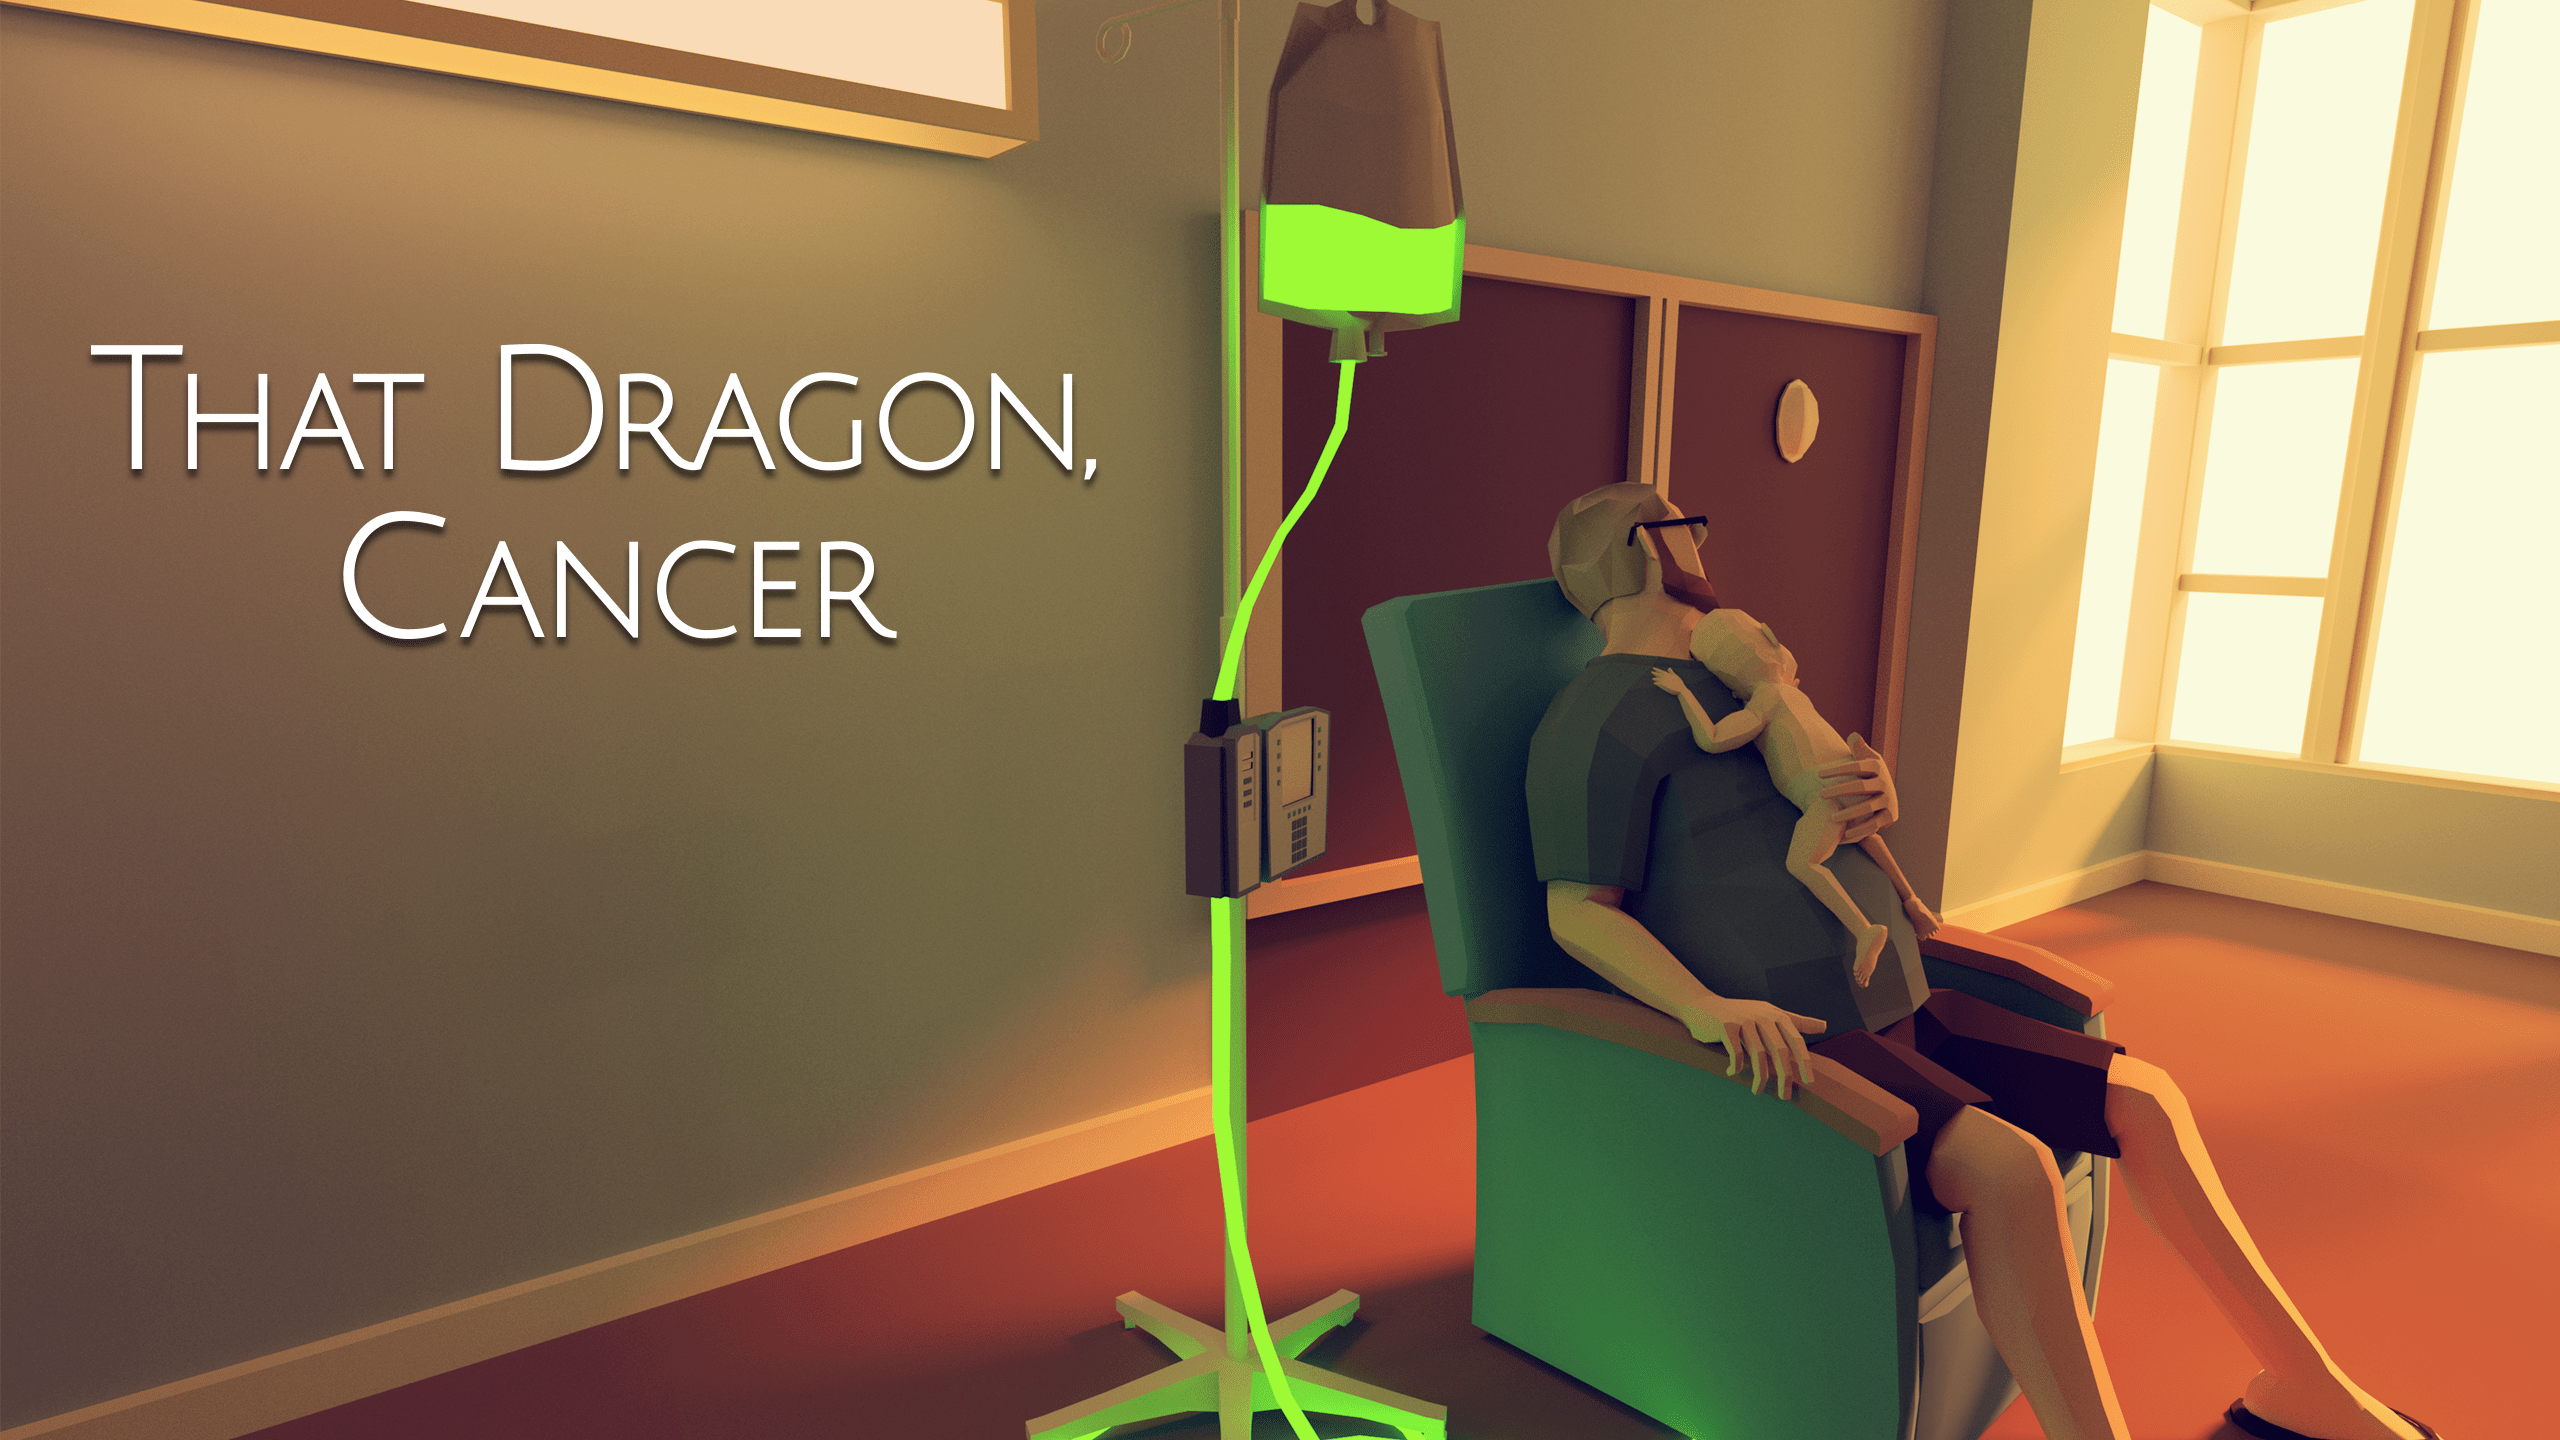 That Dragon Cancer